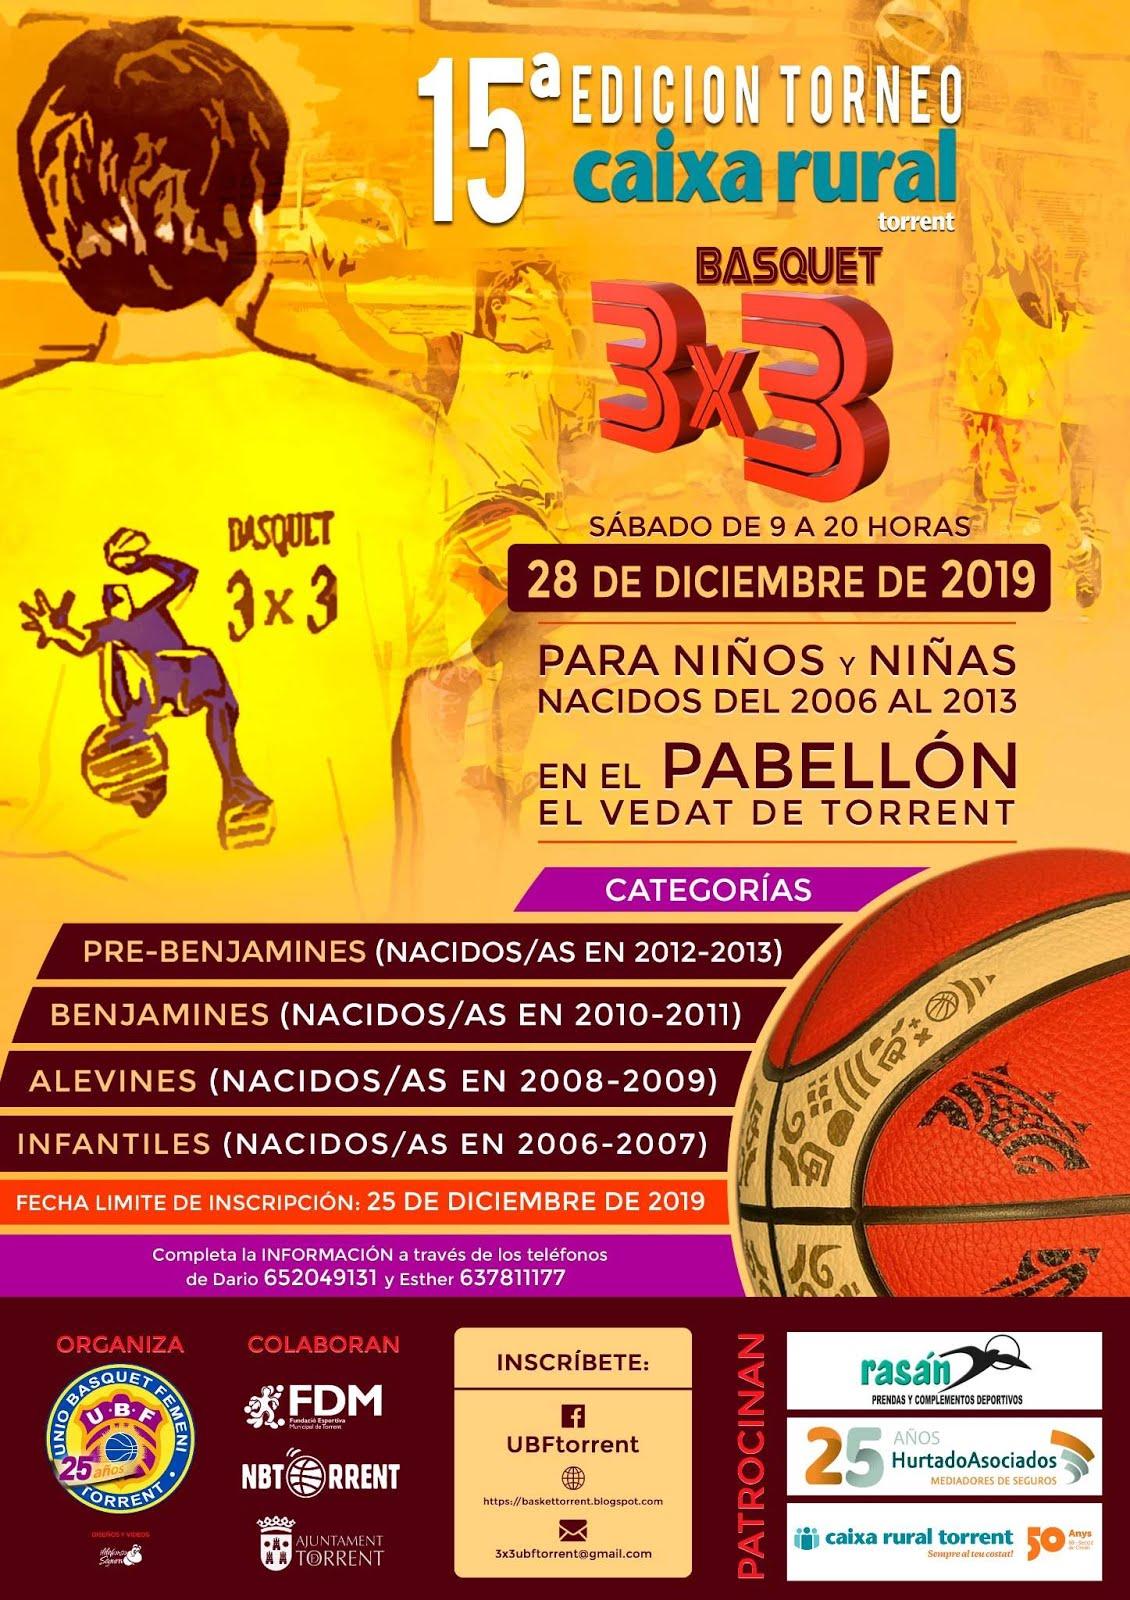 15ª edición TORNEO BASQUET 3X3 CAIXA RURAL TORRENT 2019